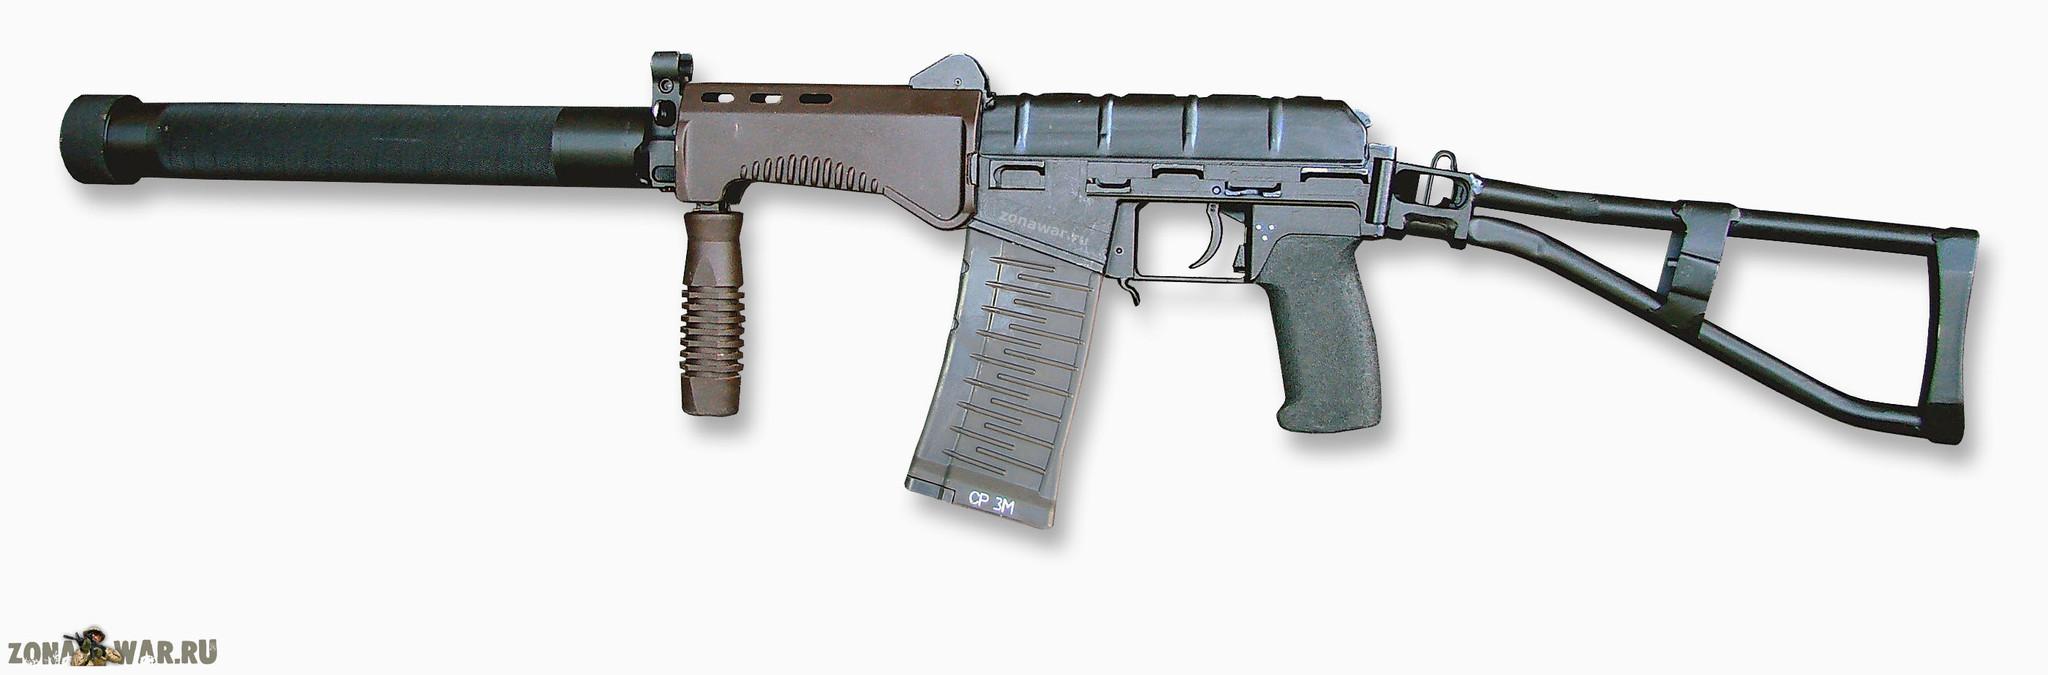 SR.3 «Vikhr» assault rifle